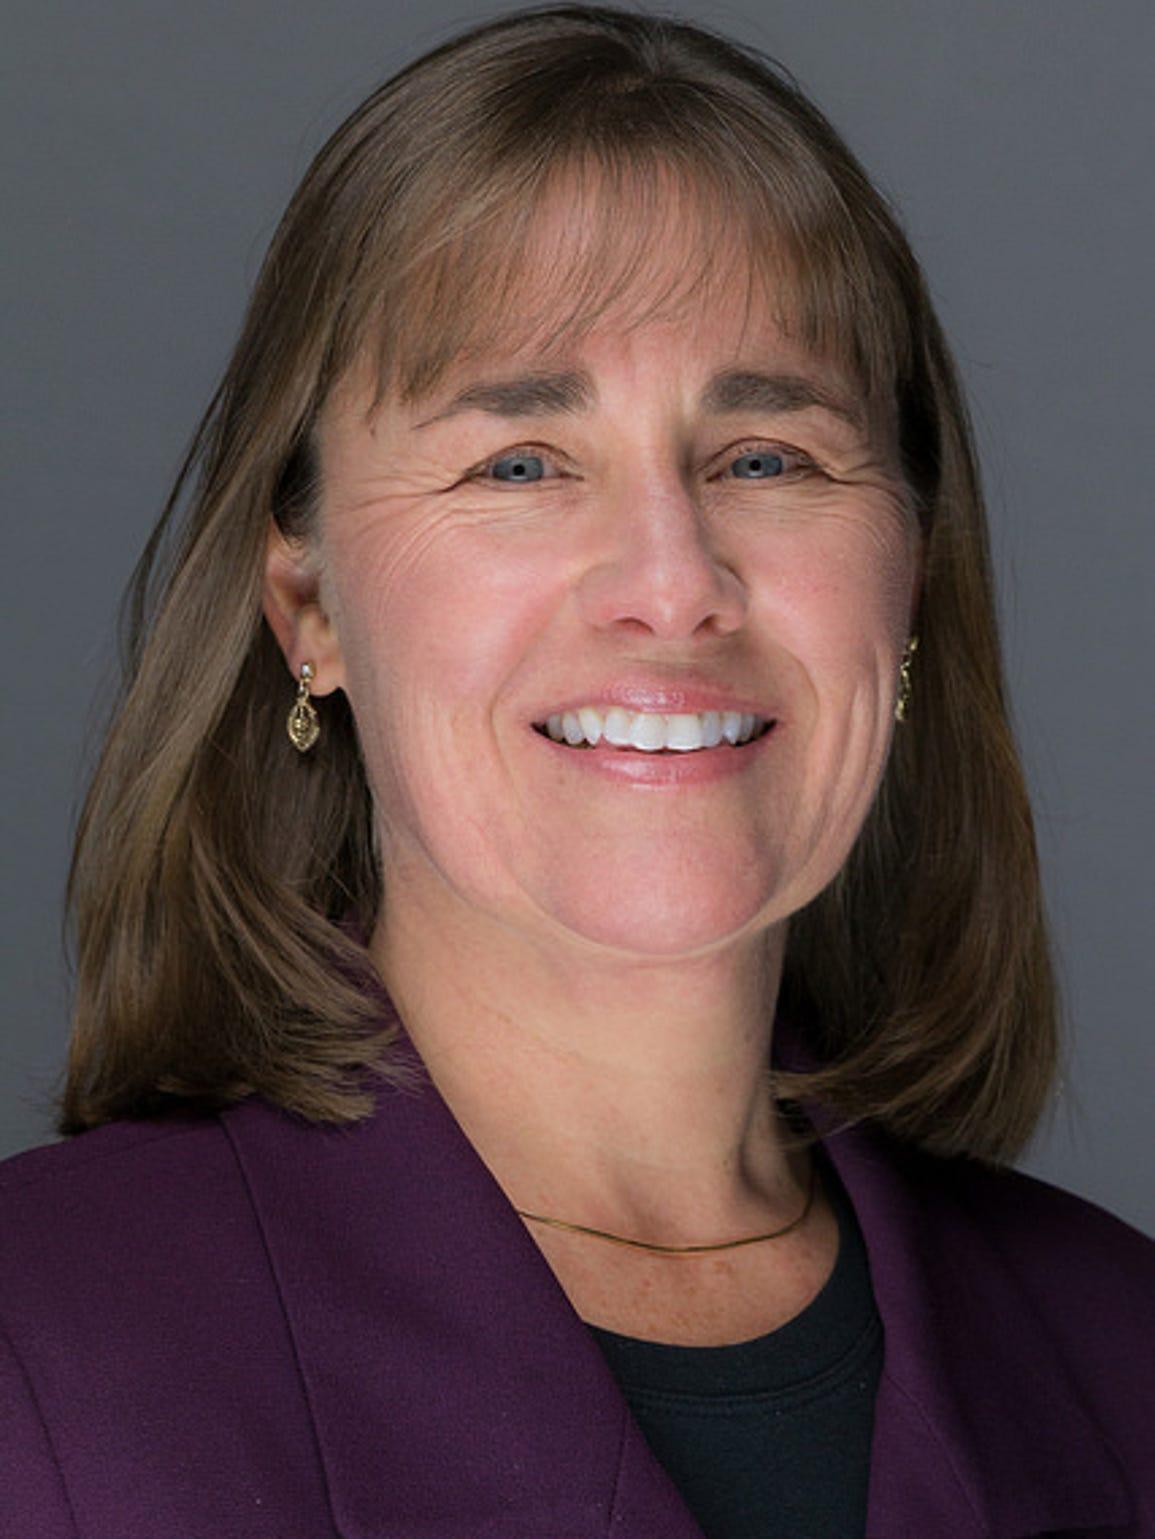 Sarah Kemp, Applied Population Lab researcher